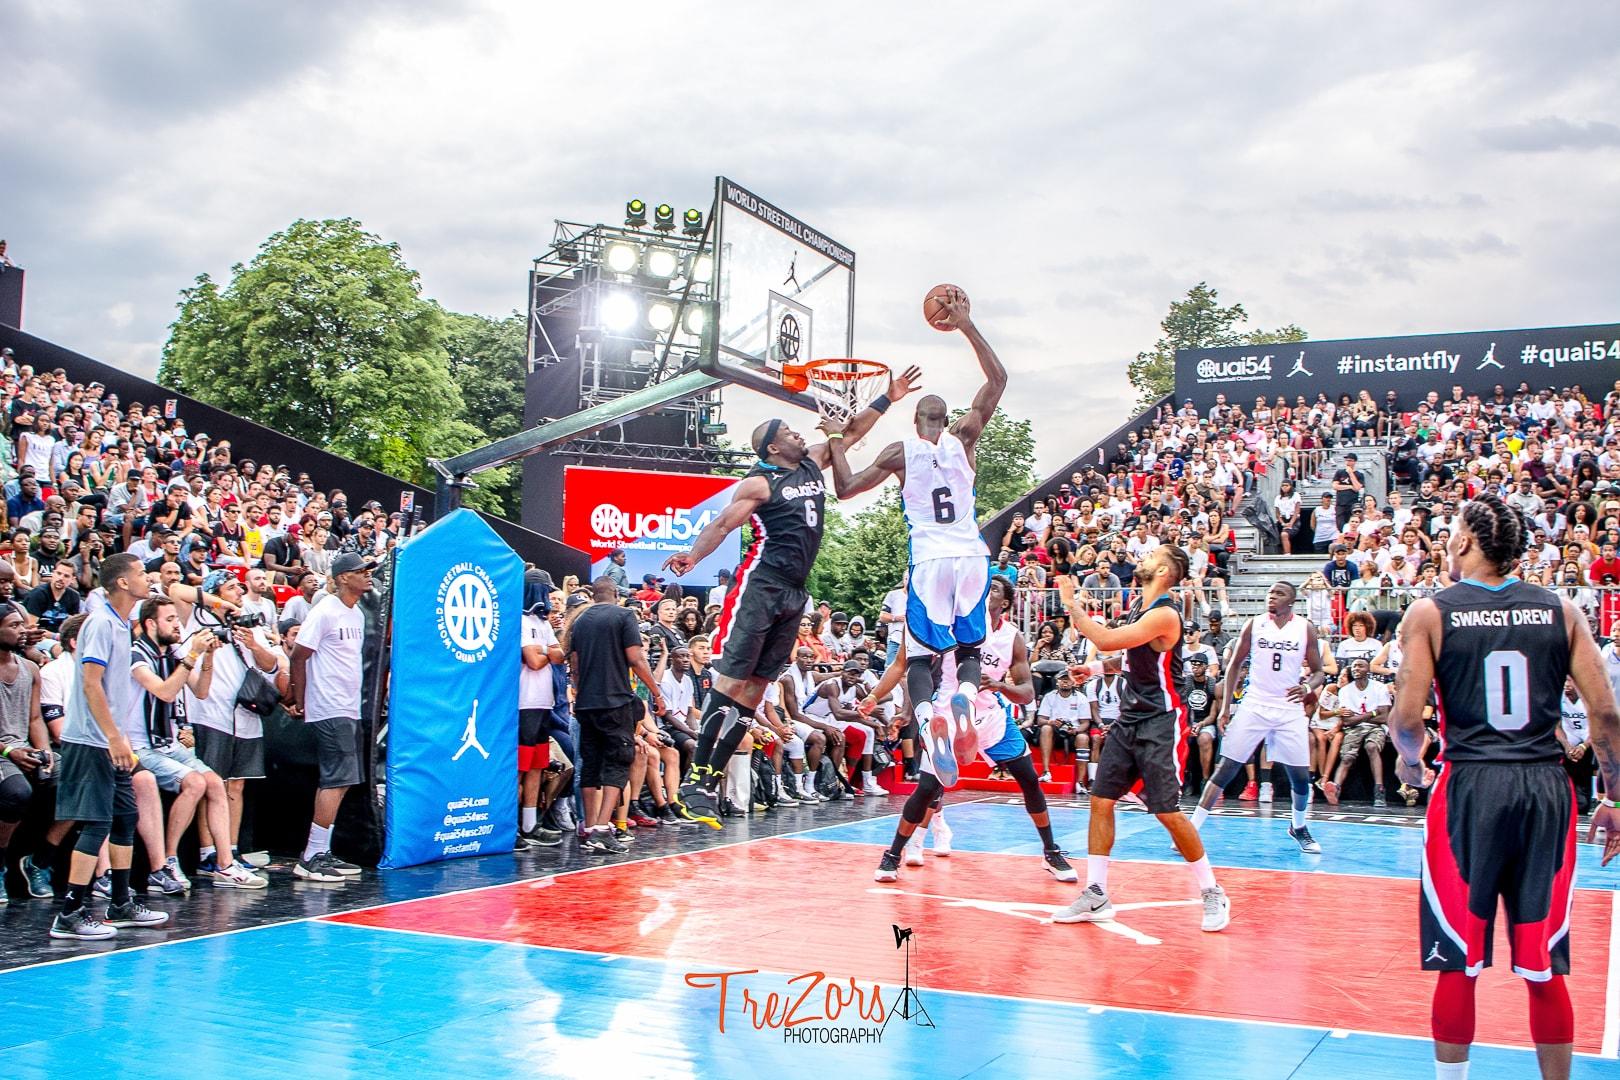 trezors-photography-photographe-professionnel-toulouse-31-sport-lifestyle-quai-54-basketball